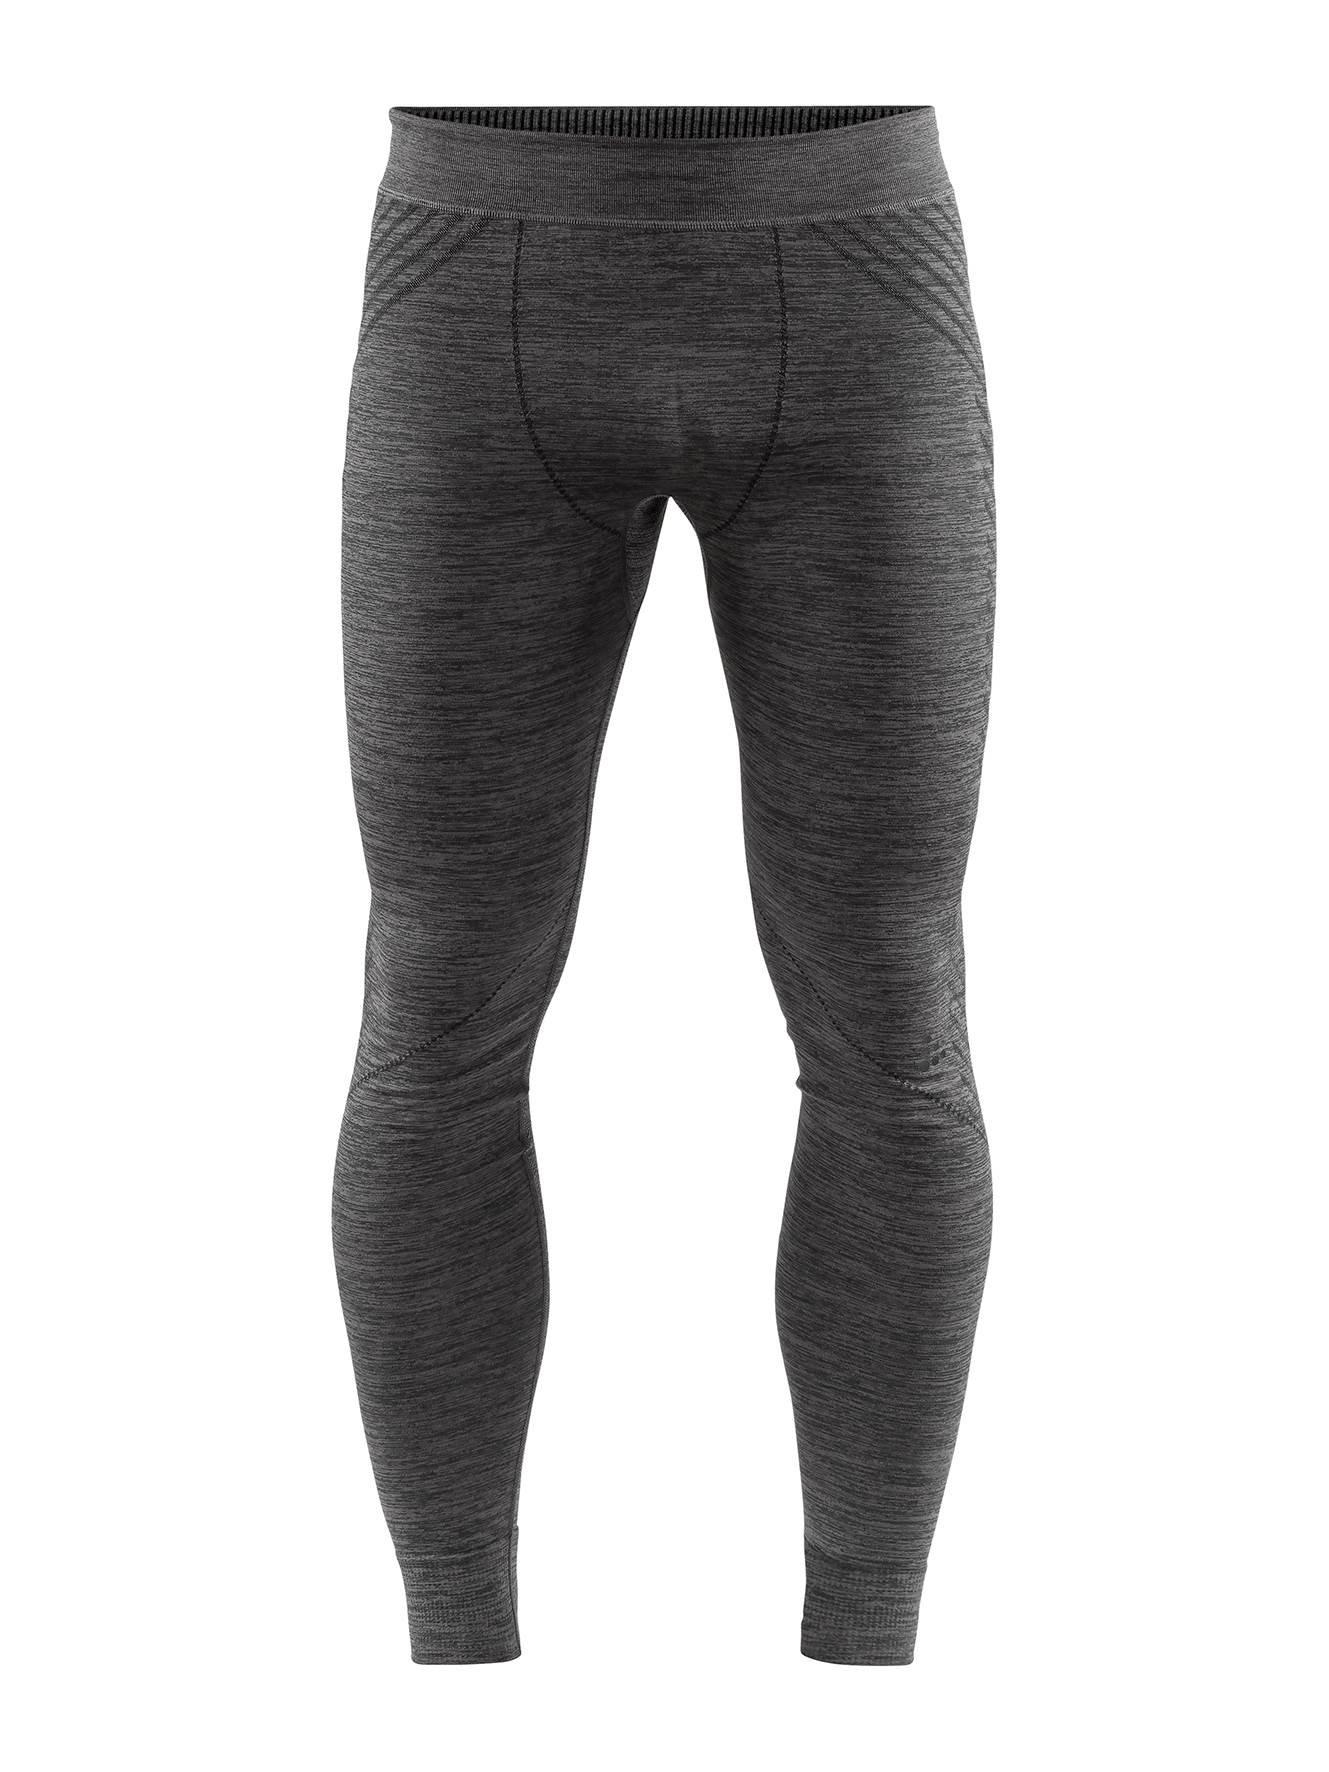 Craft Spodky Fuseknit Comfort tmavo šedá XL